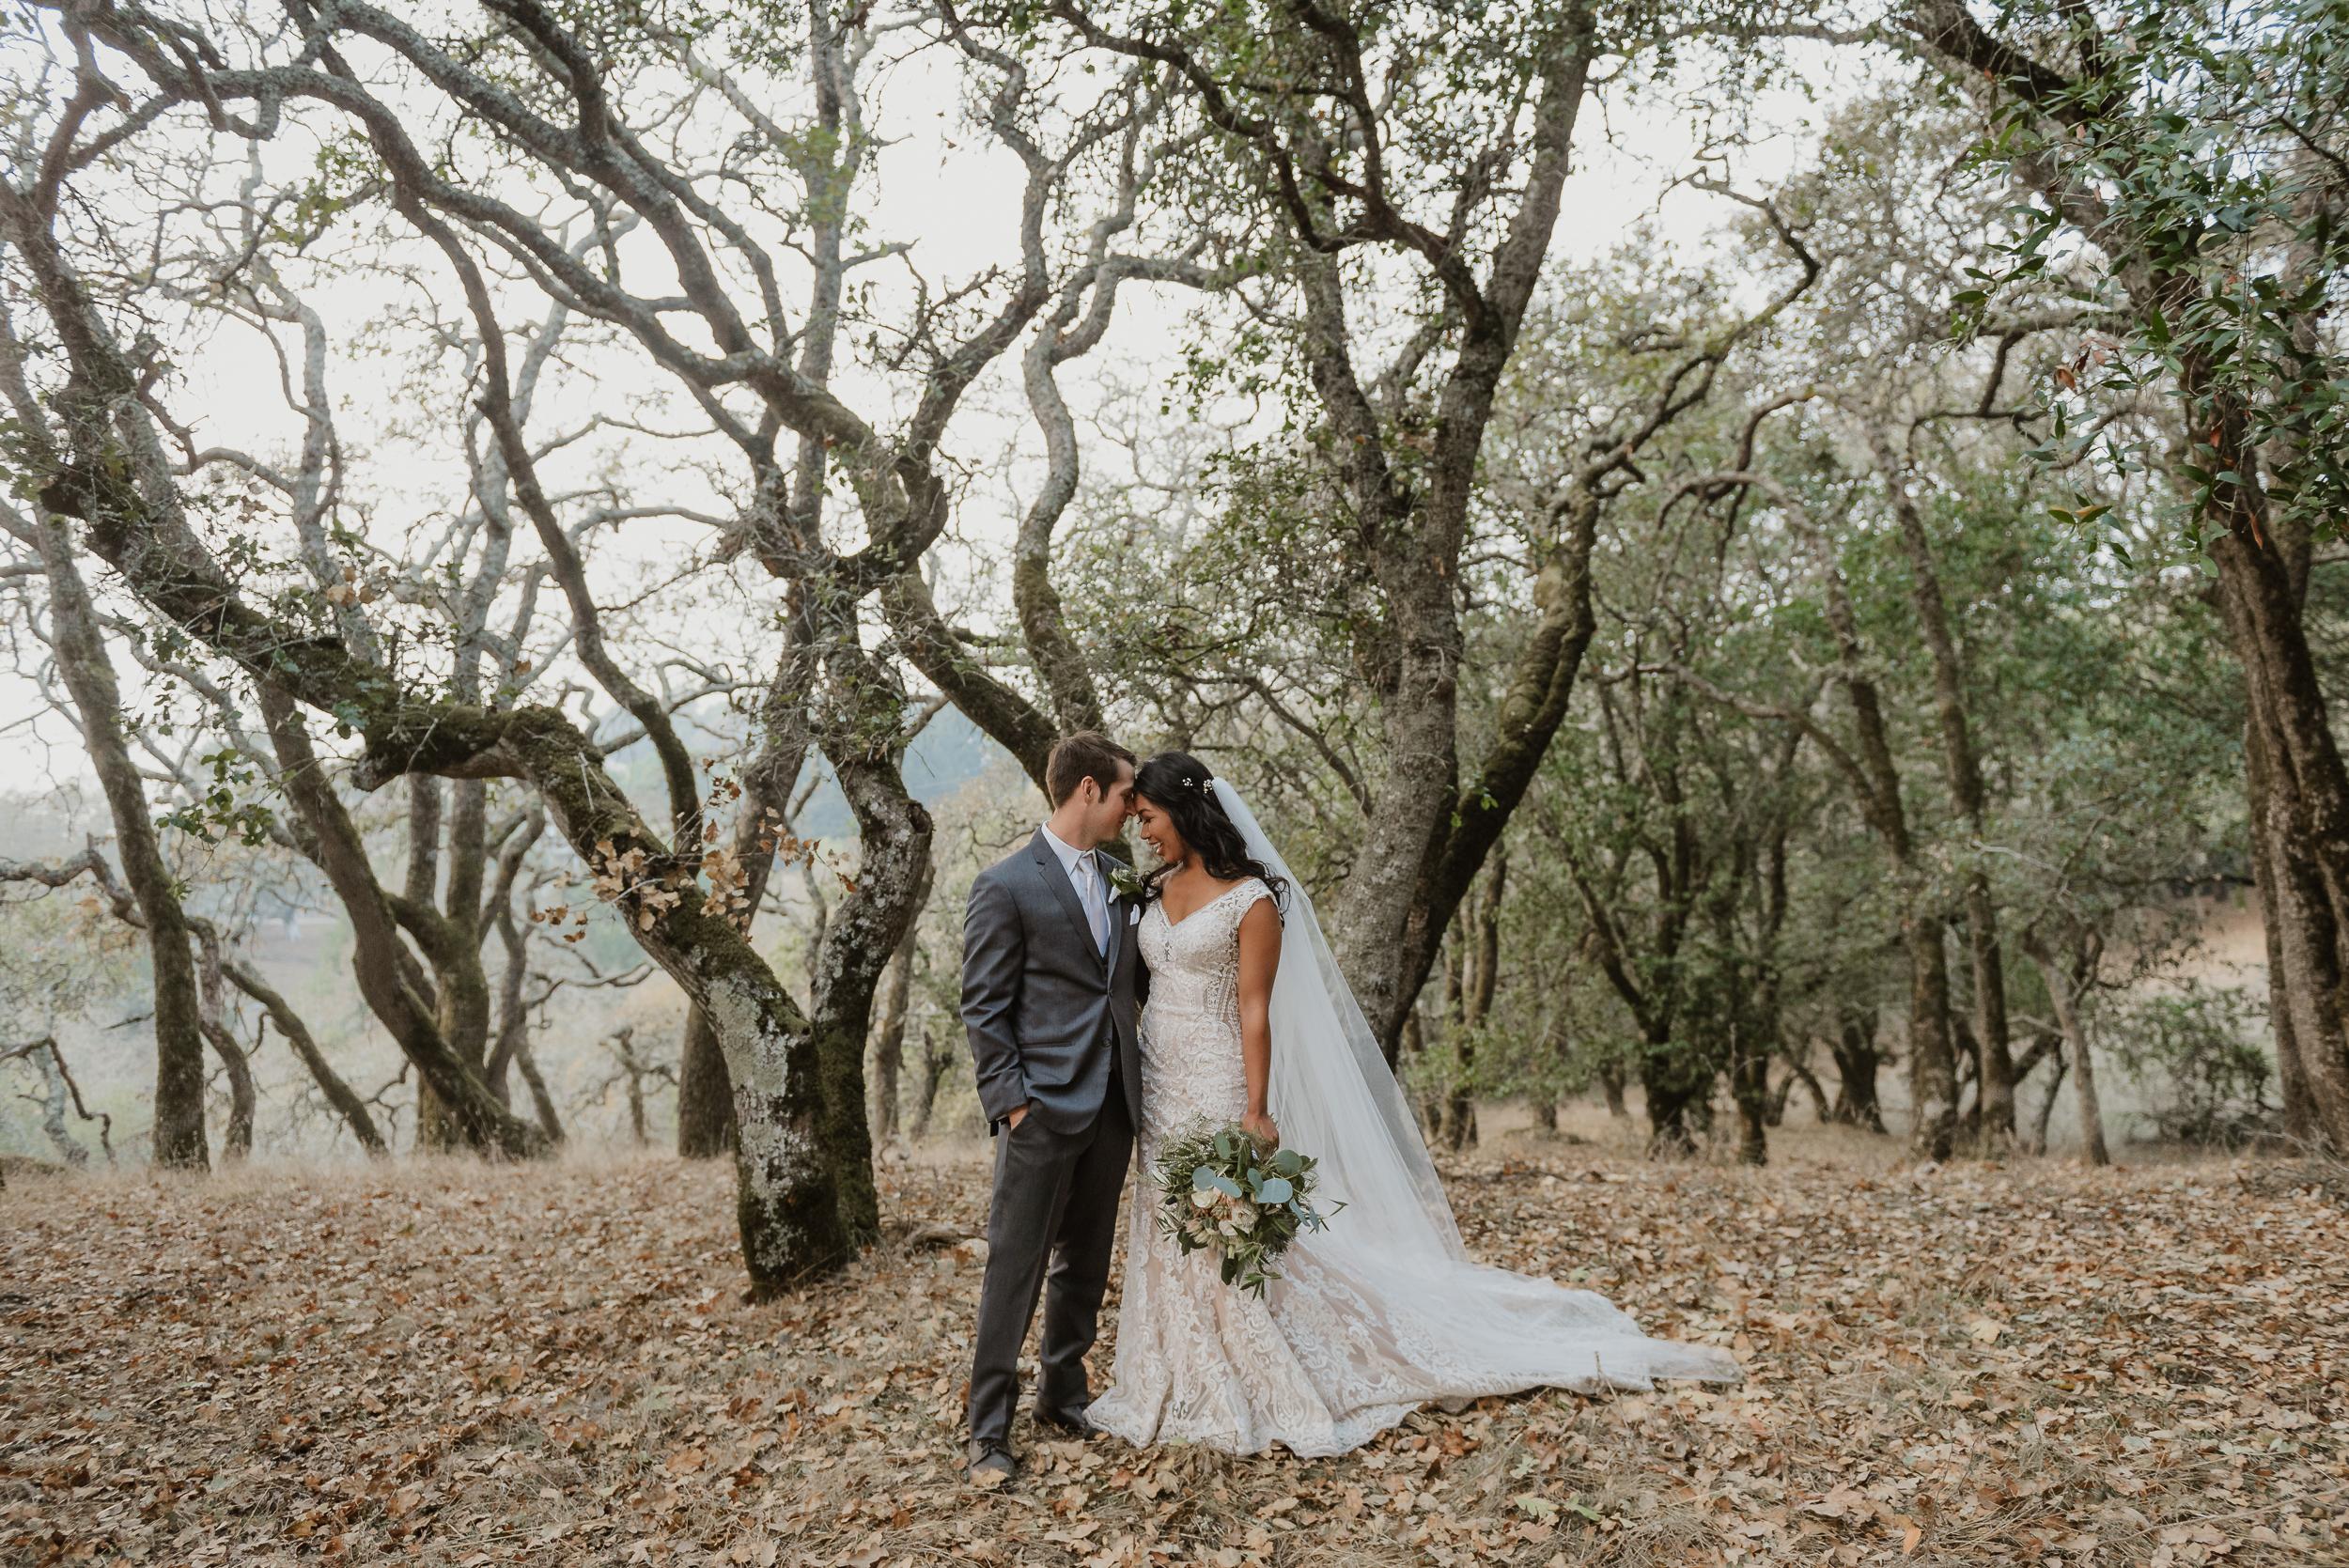 069marin-petaluma-backyard-wedding-vivianchen-477.jpg